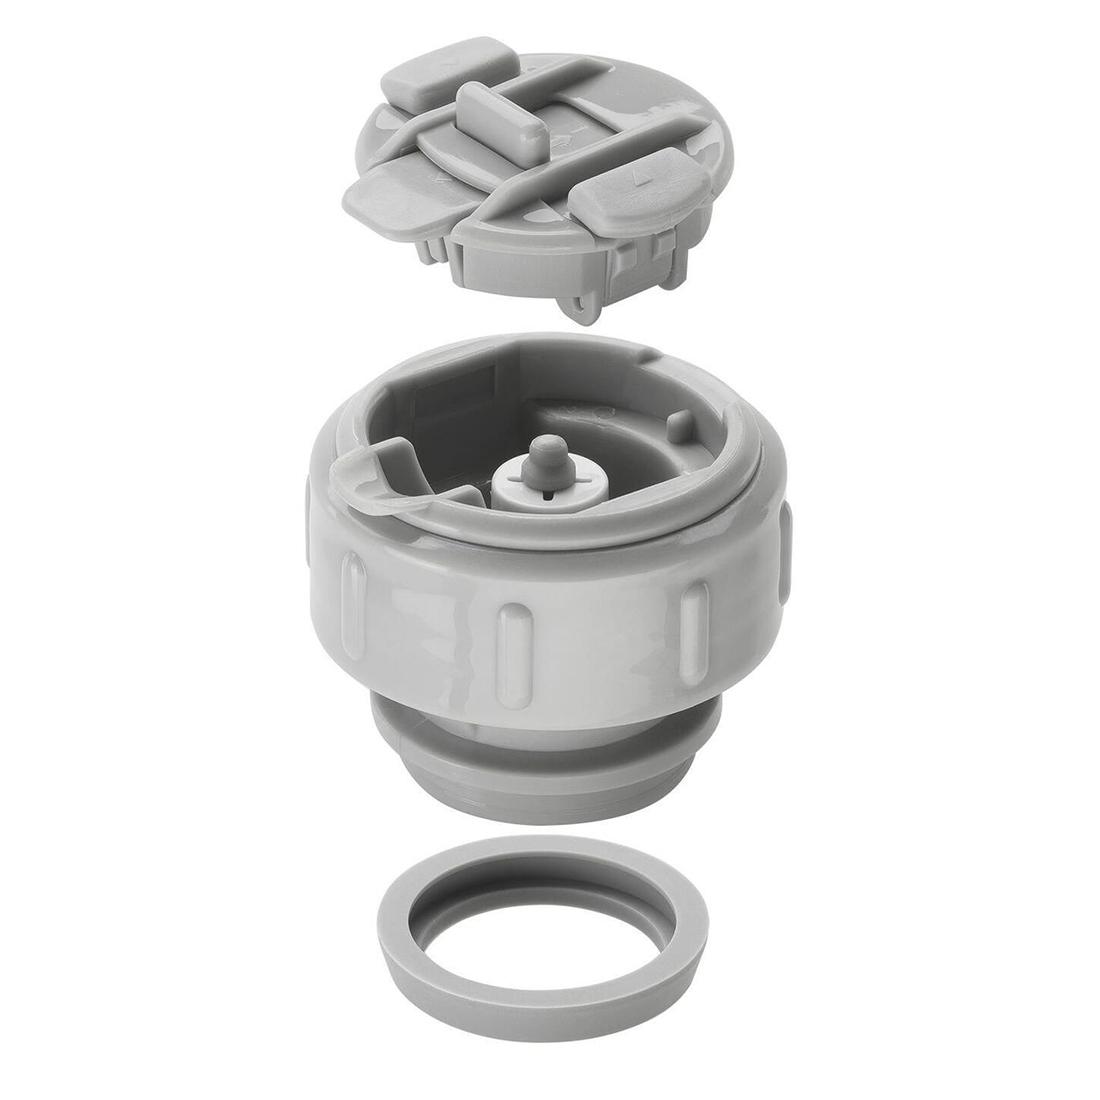 Garrafa Térmica Zwilling Thermo 1L aço inox 395005130